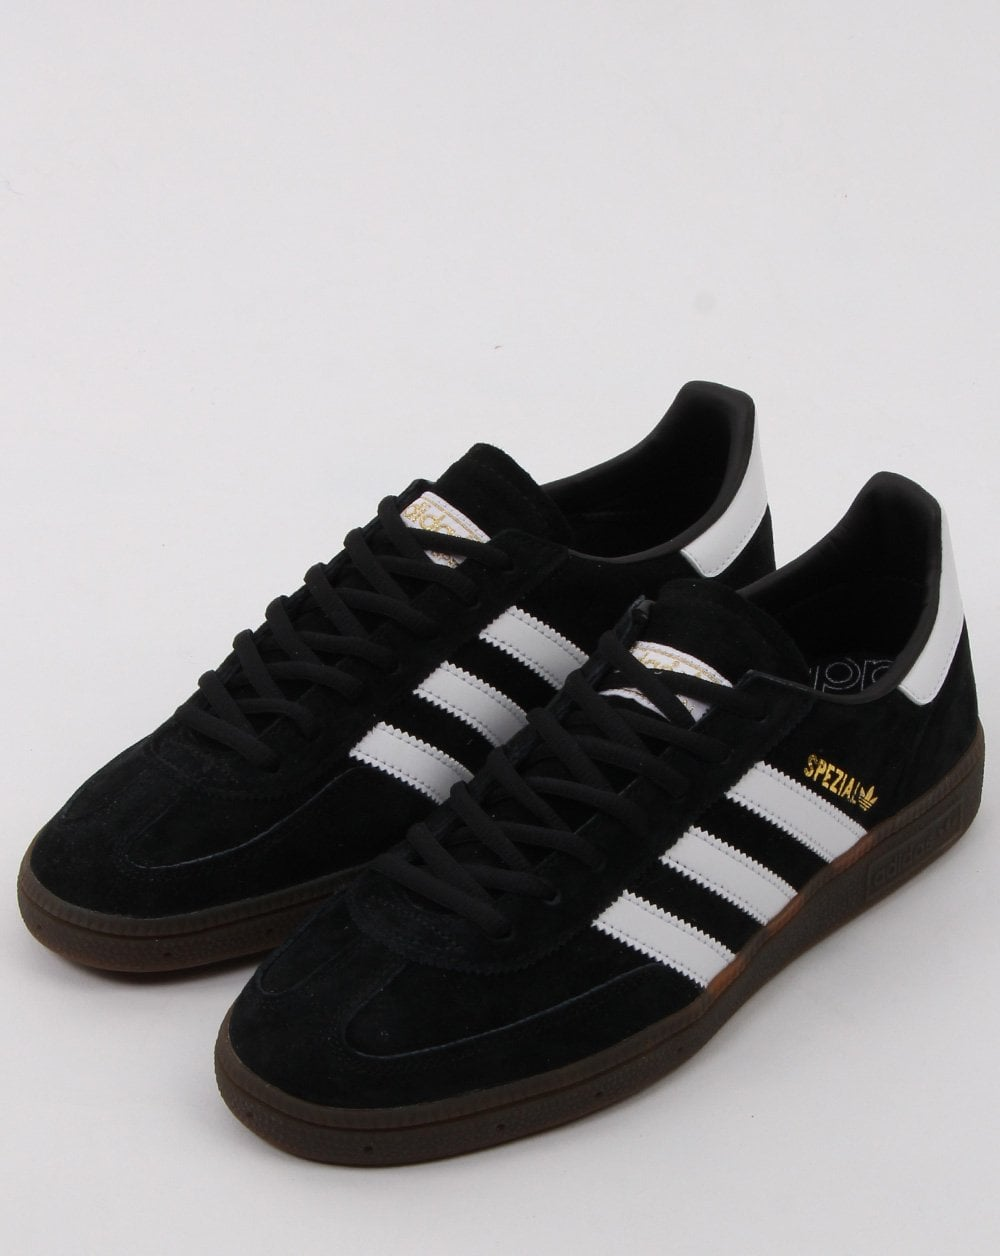 Adidas Handball Spezial Trainers Black White 80s Casual Classics